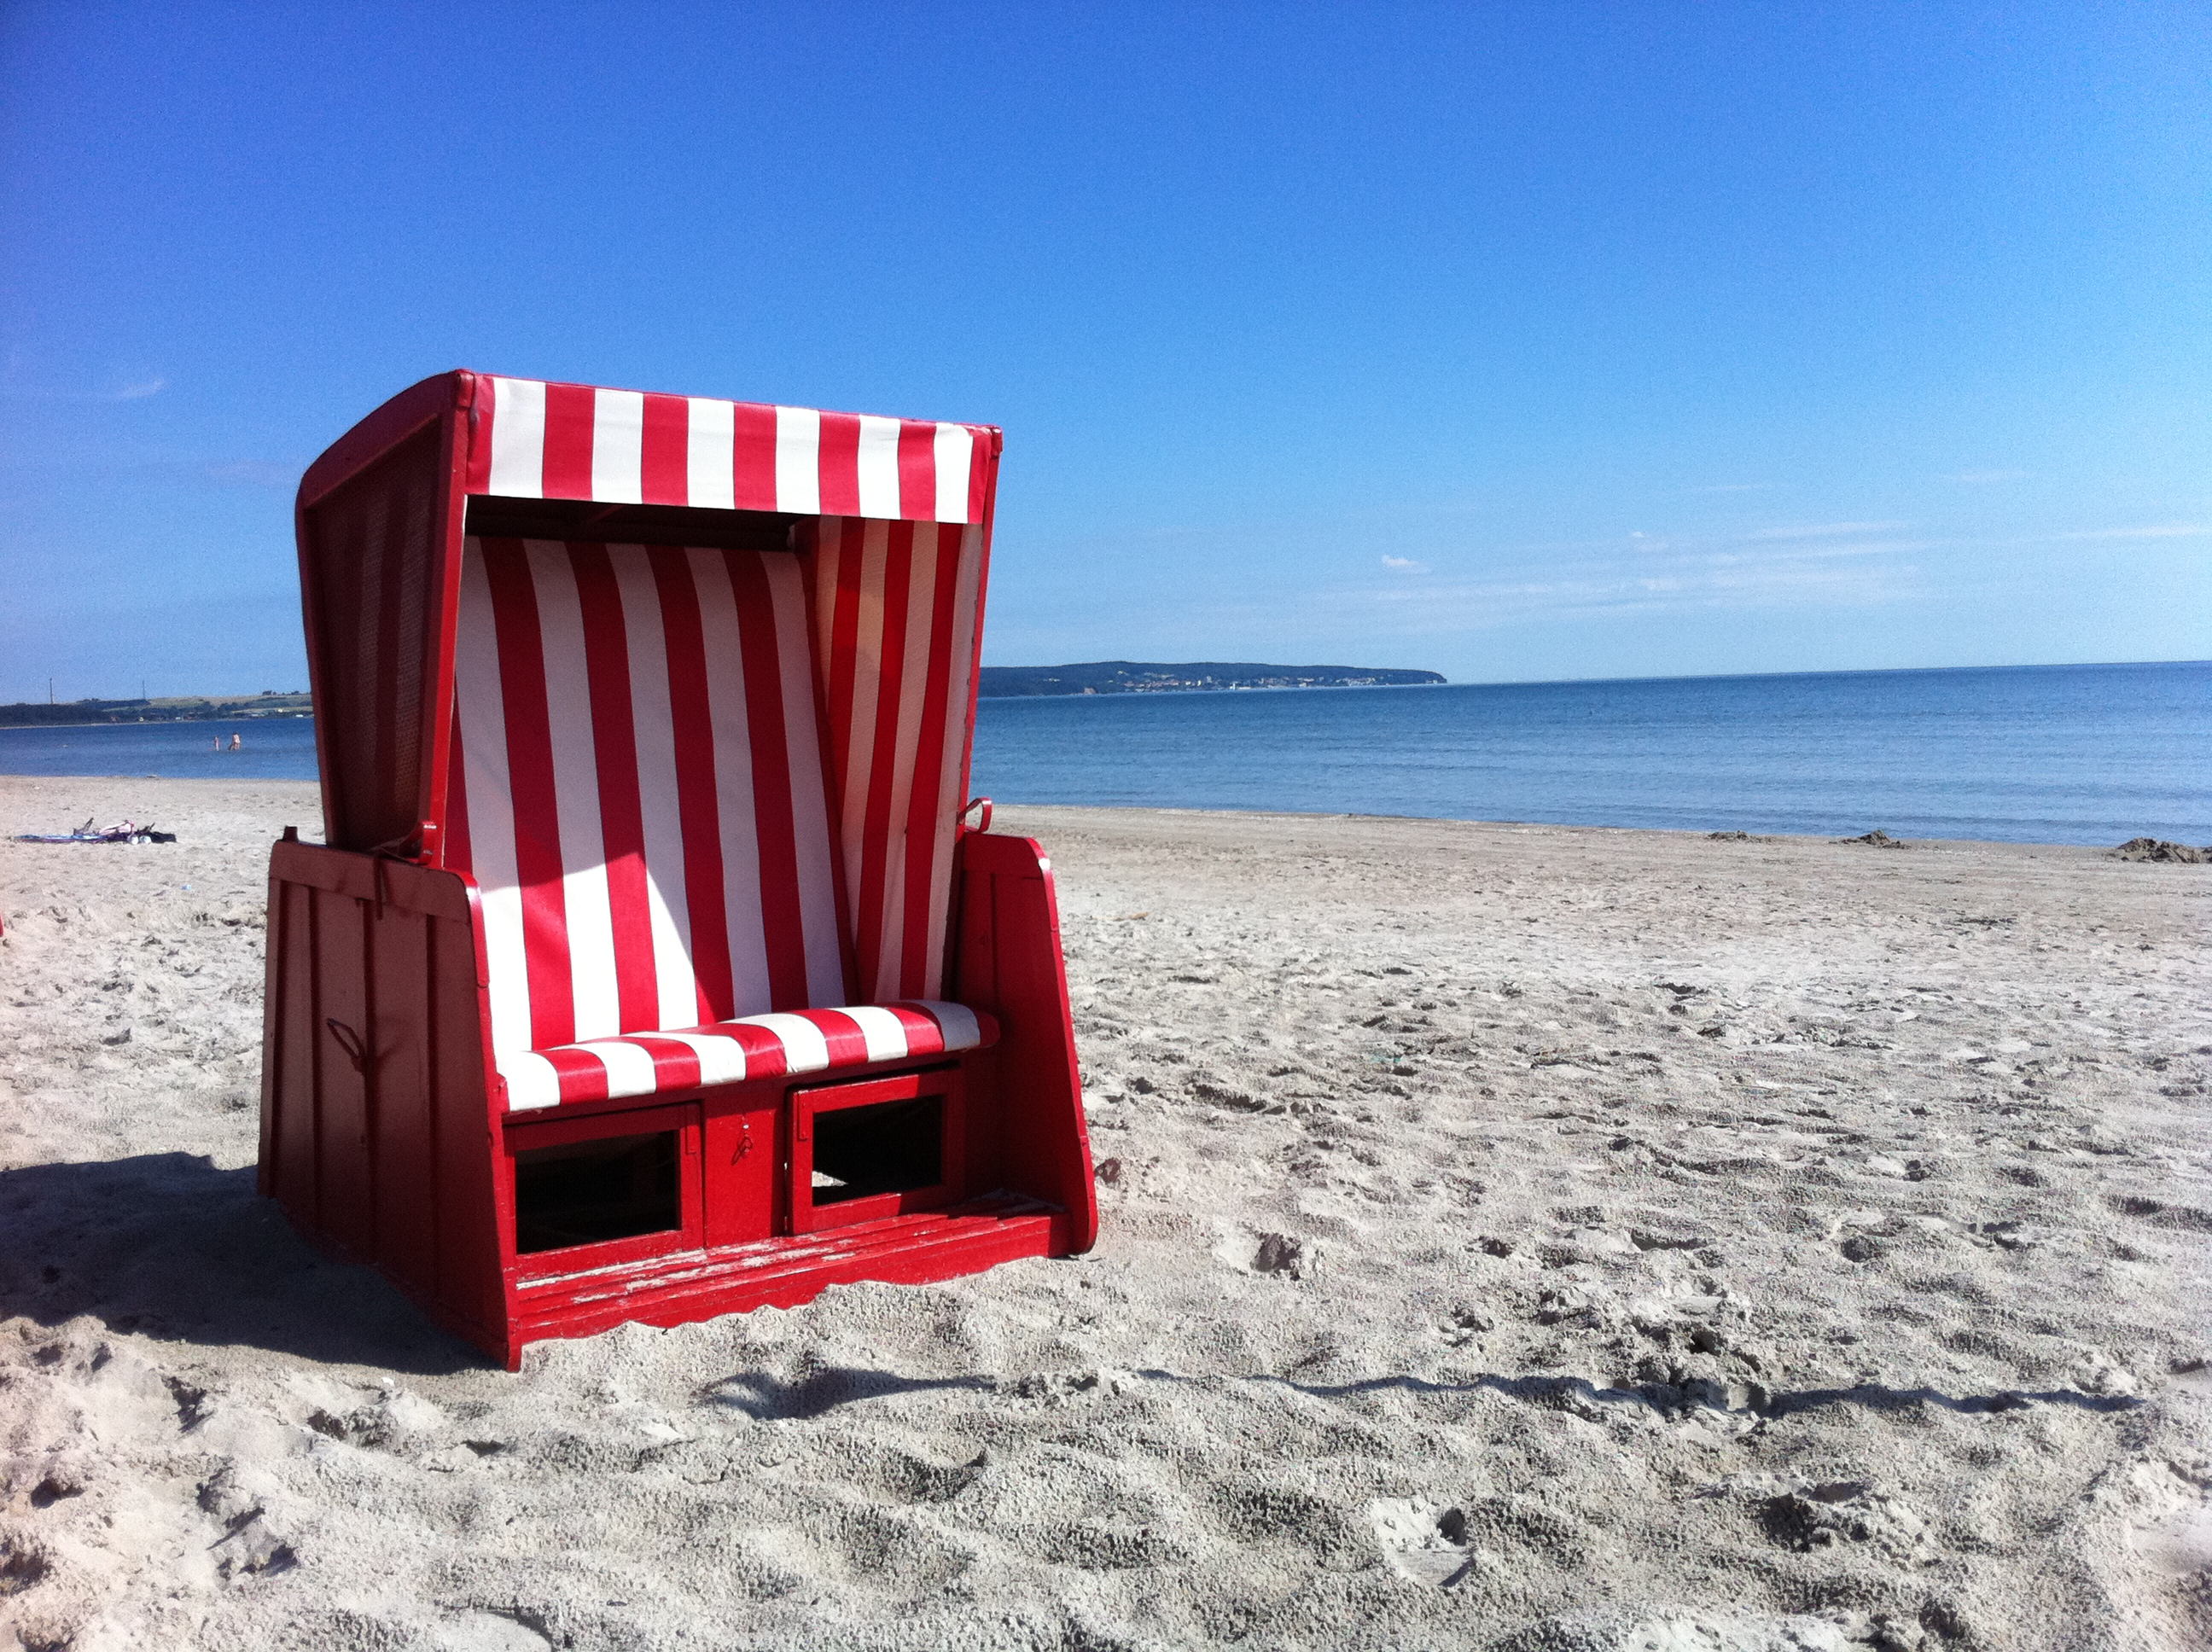 Strandkorb auf Sanddstrand.